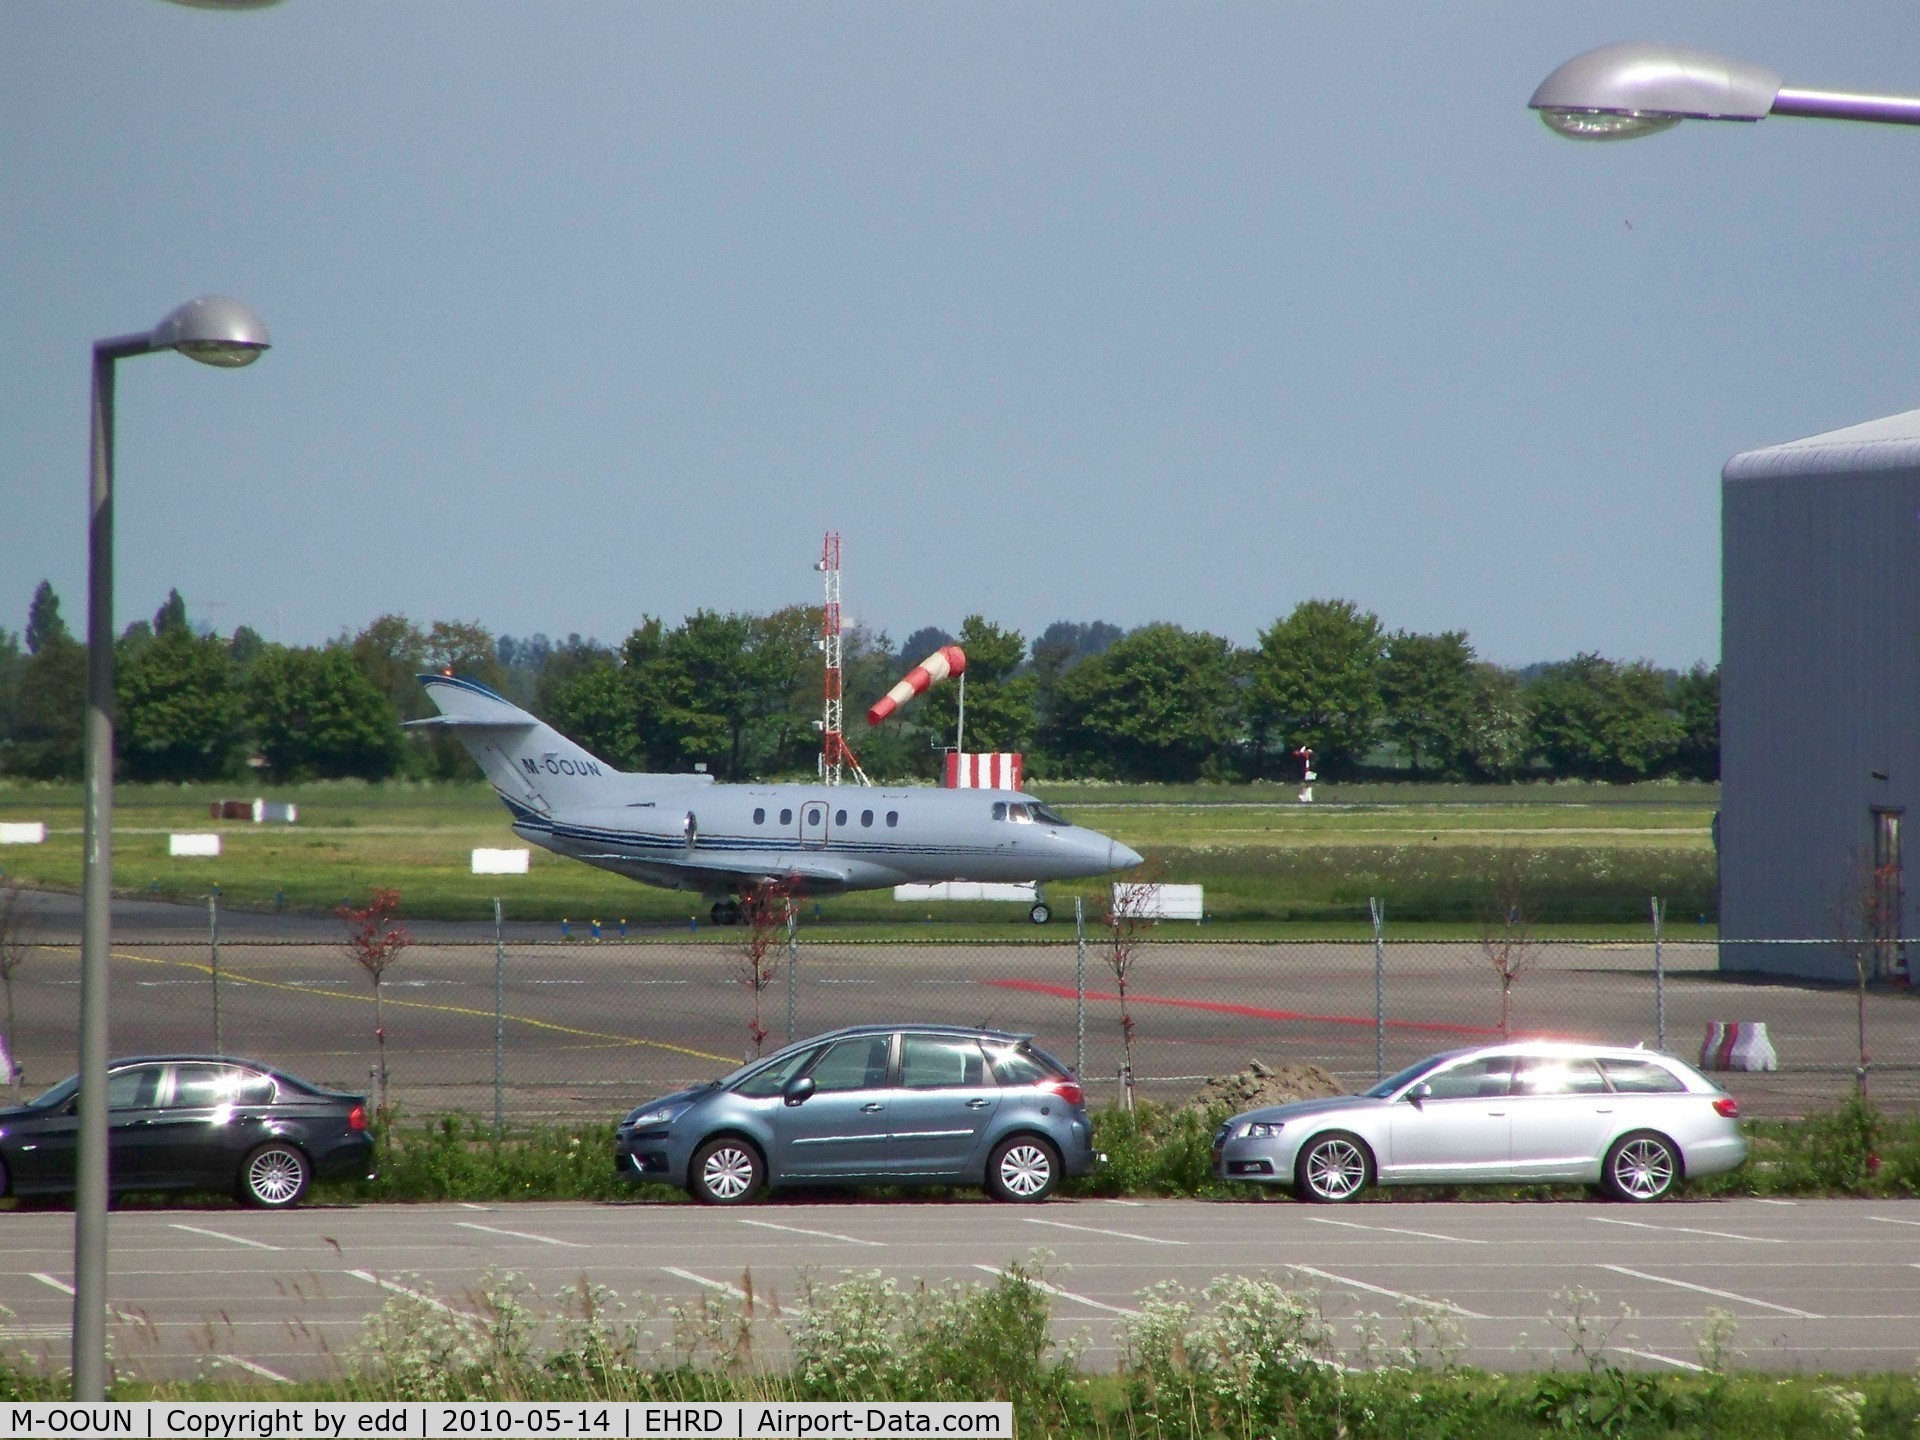 M-OOUN, 2000 Raytheon Hawker 800XP C/N 258514, hs 125.8